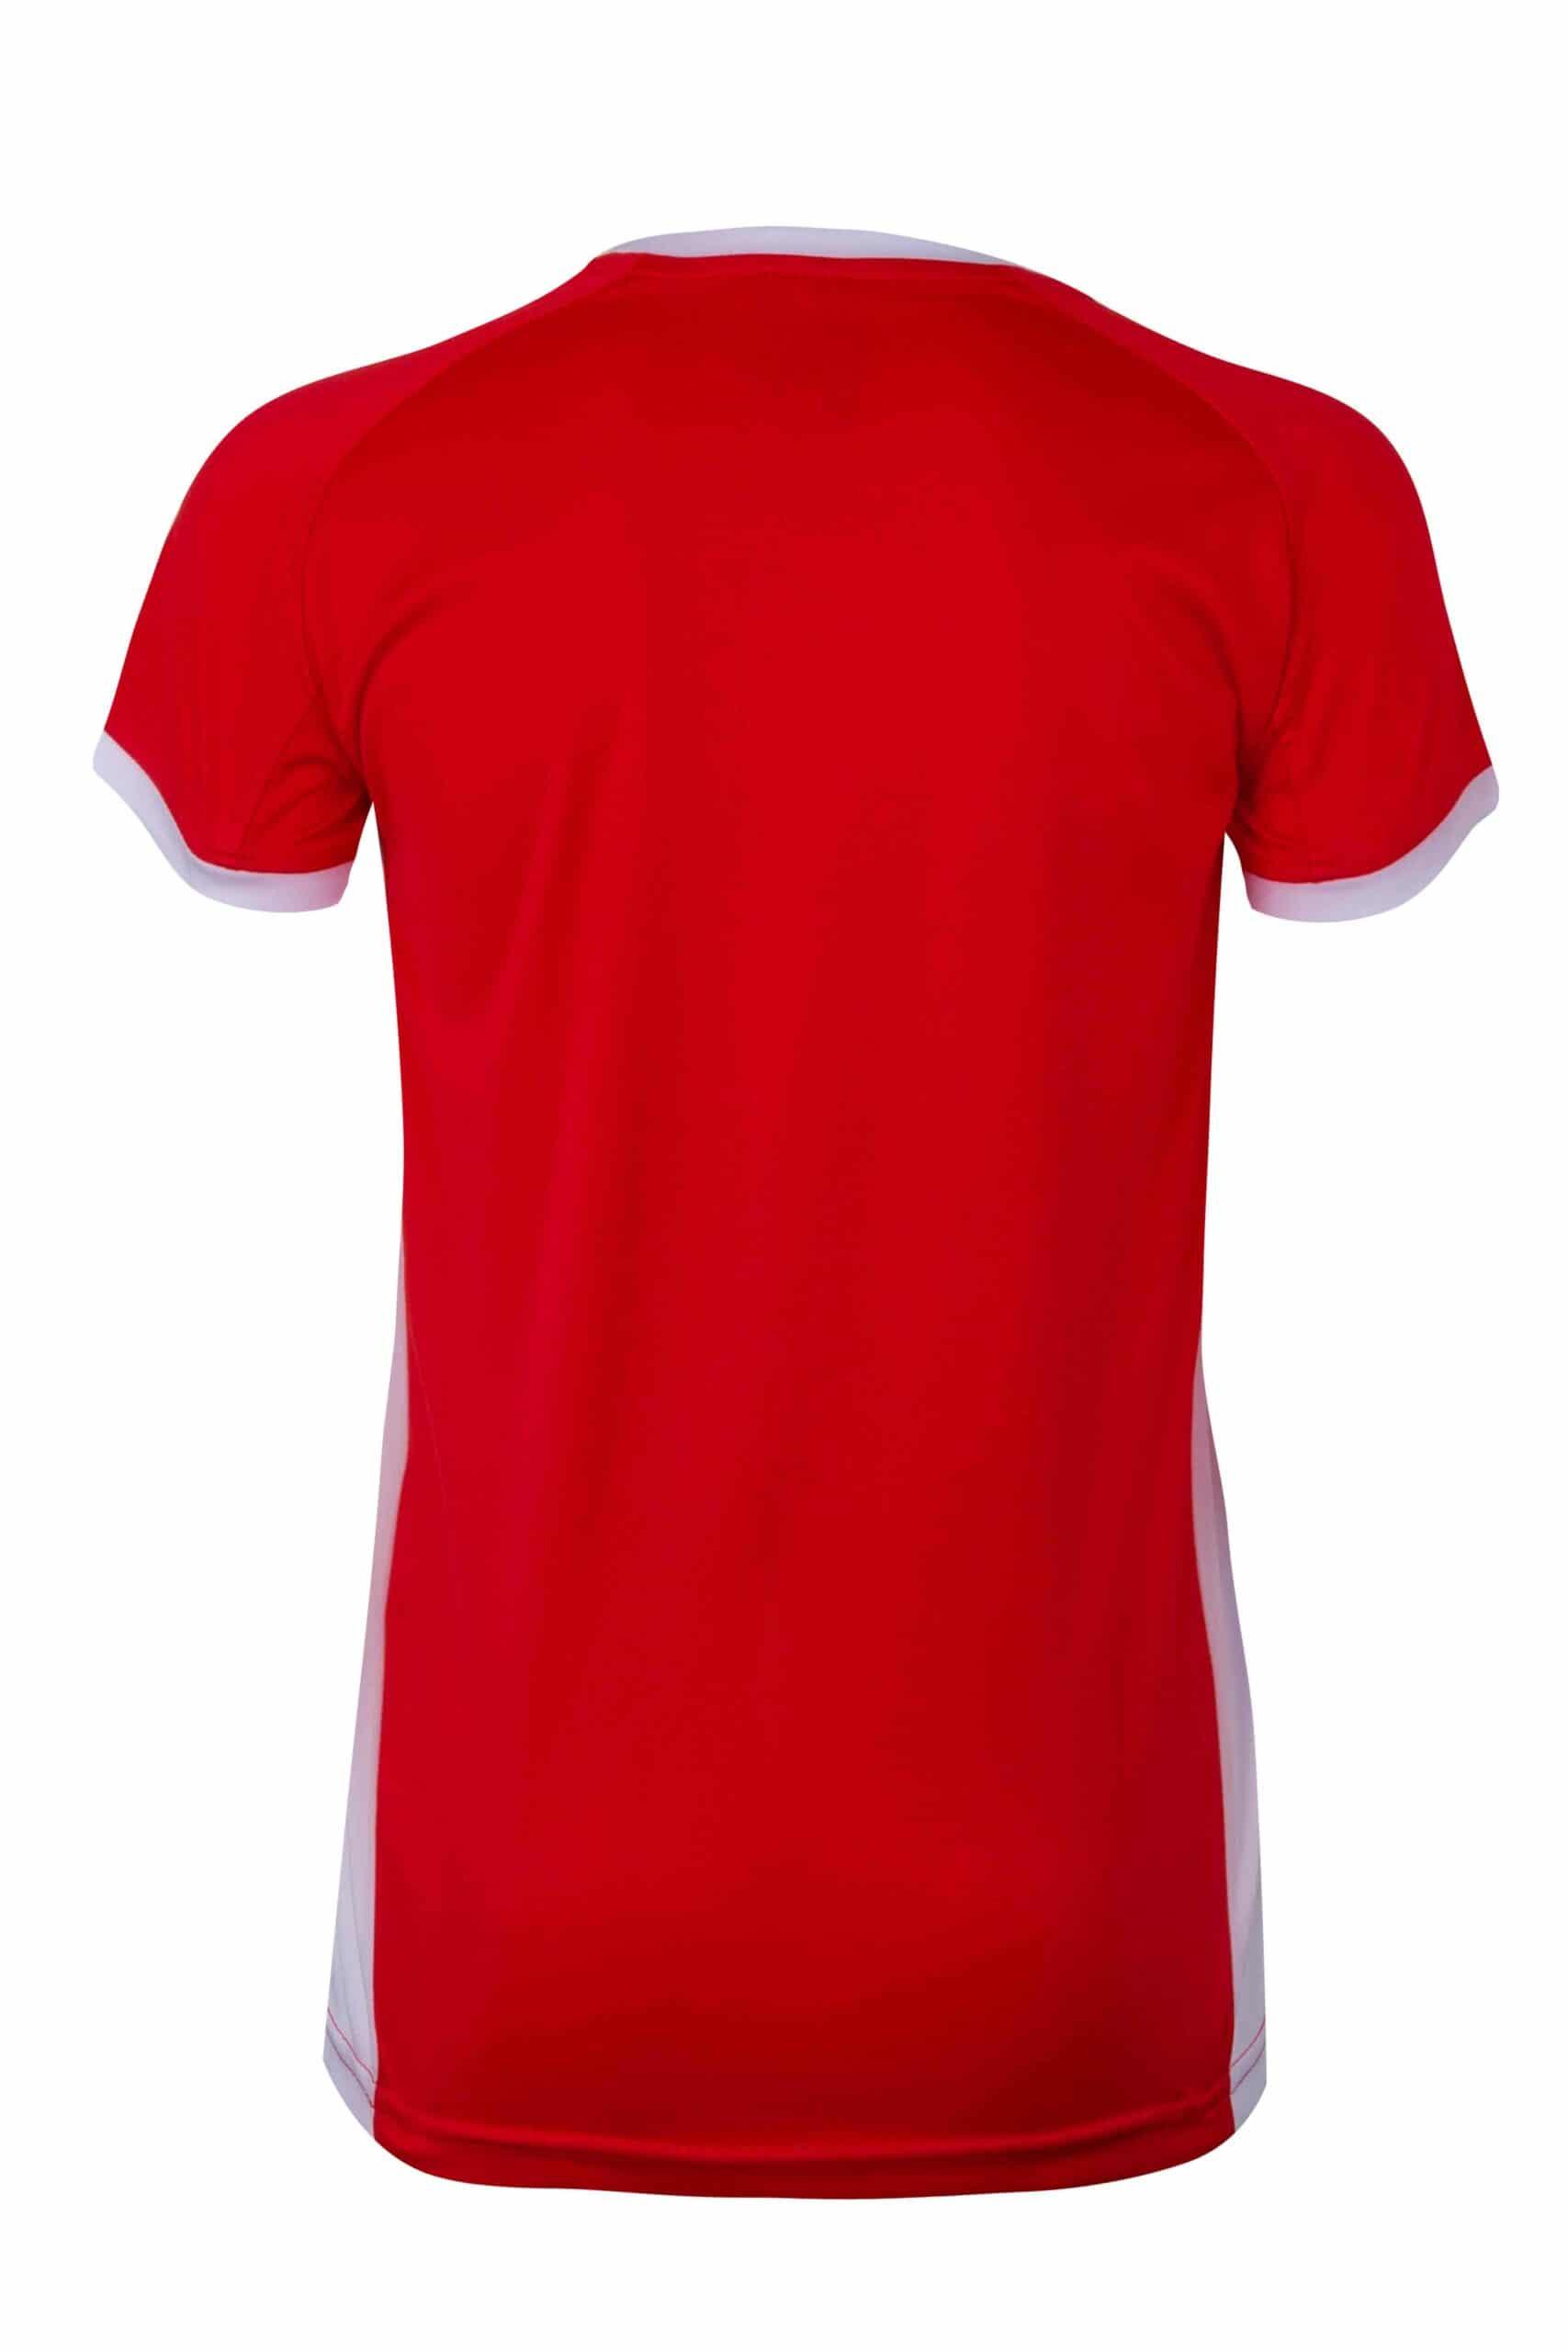 Mukua Mk531v Camiseta TÉcnica Manga Corta Bicolor NiÑo Red White 2